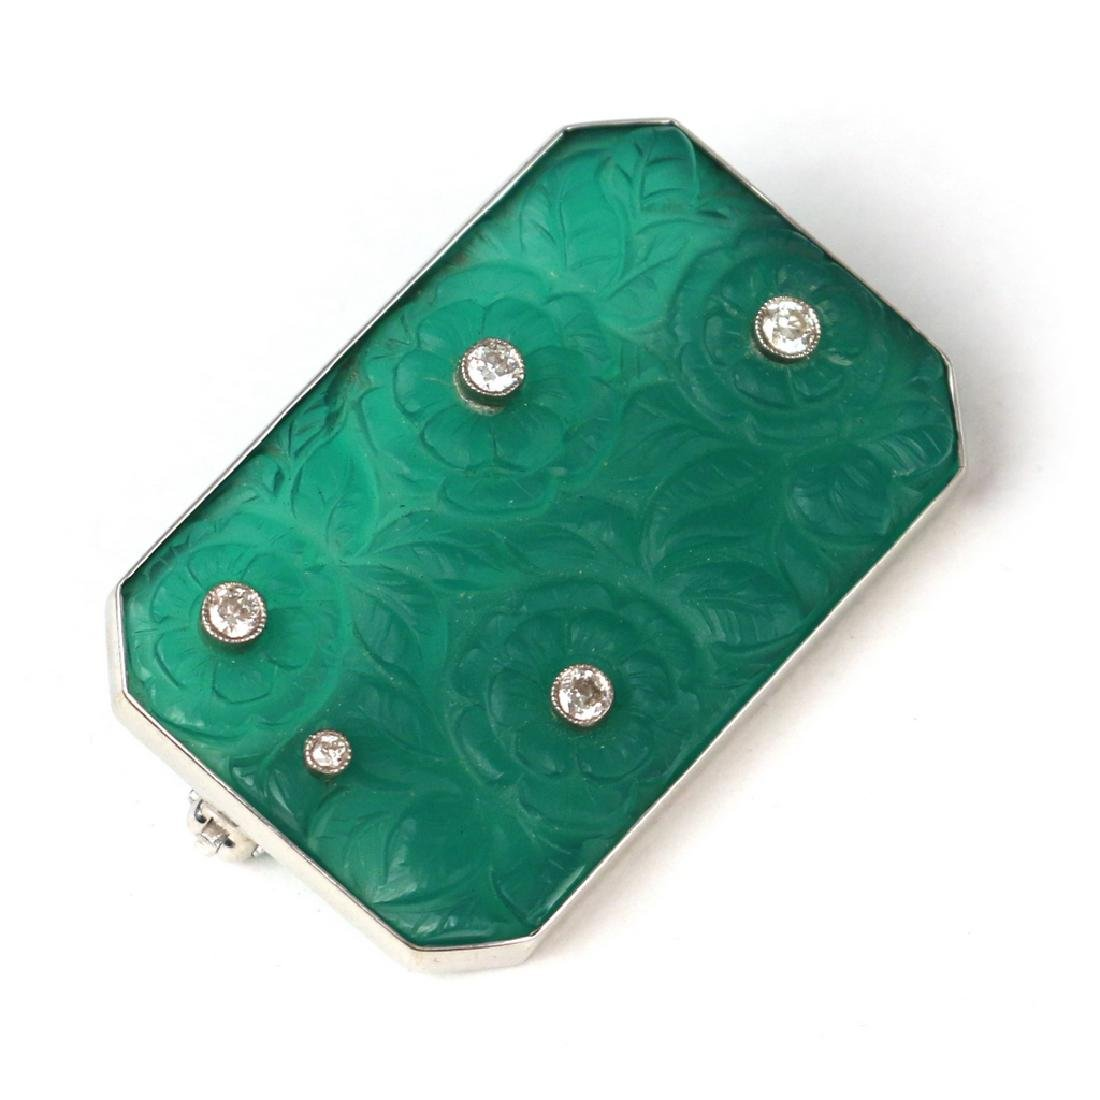 PLIQUE-A-JOUR & DIAMOND PIN - 2